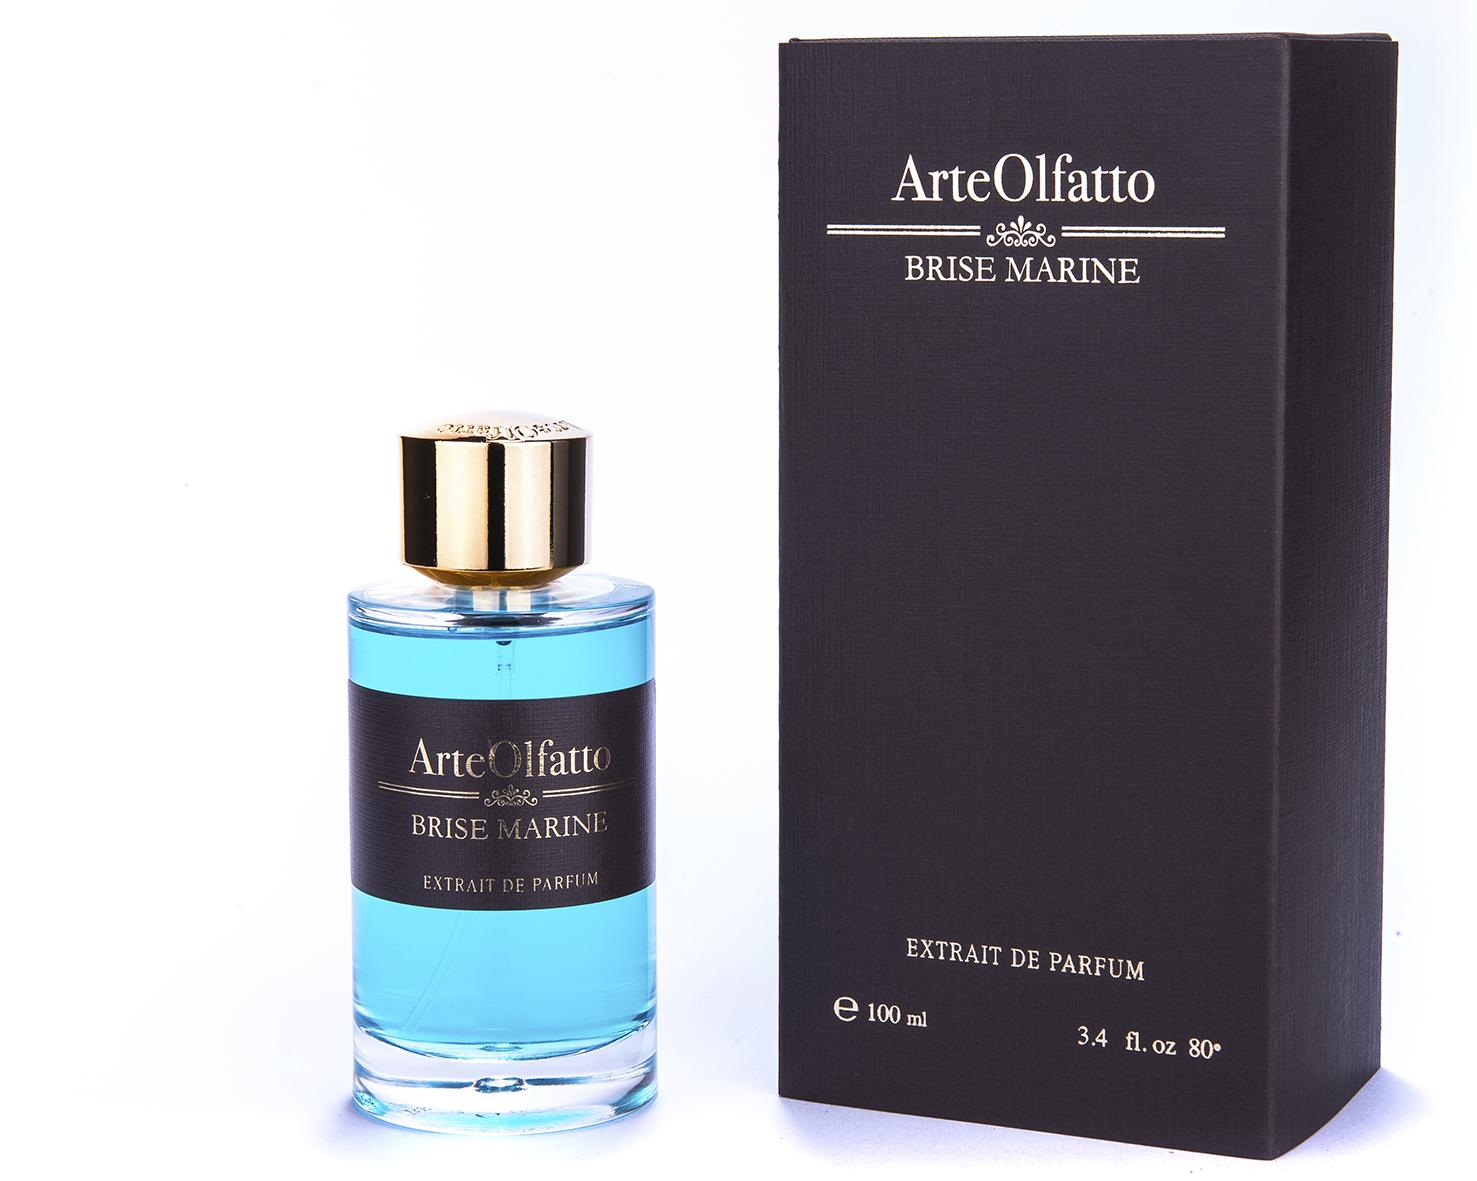 ArteOlfatto - Luxury Perfumes Brise Marine EXTRAIT Parfum 100 ml